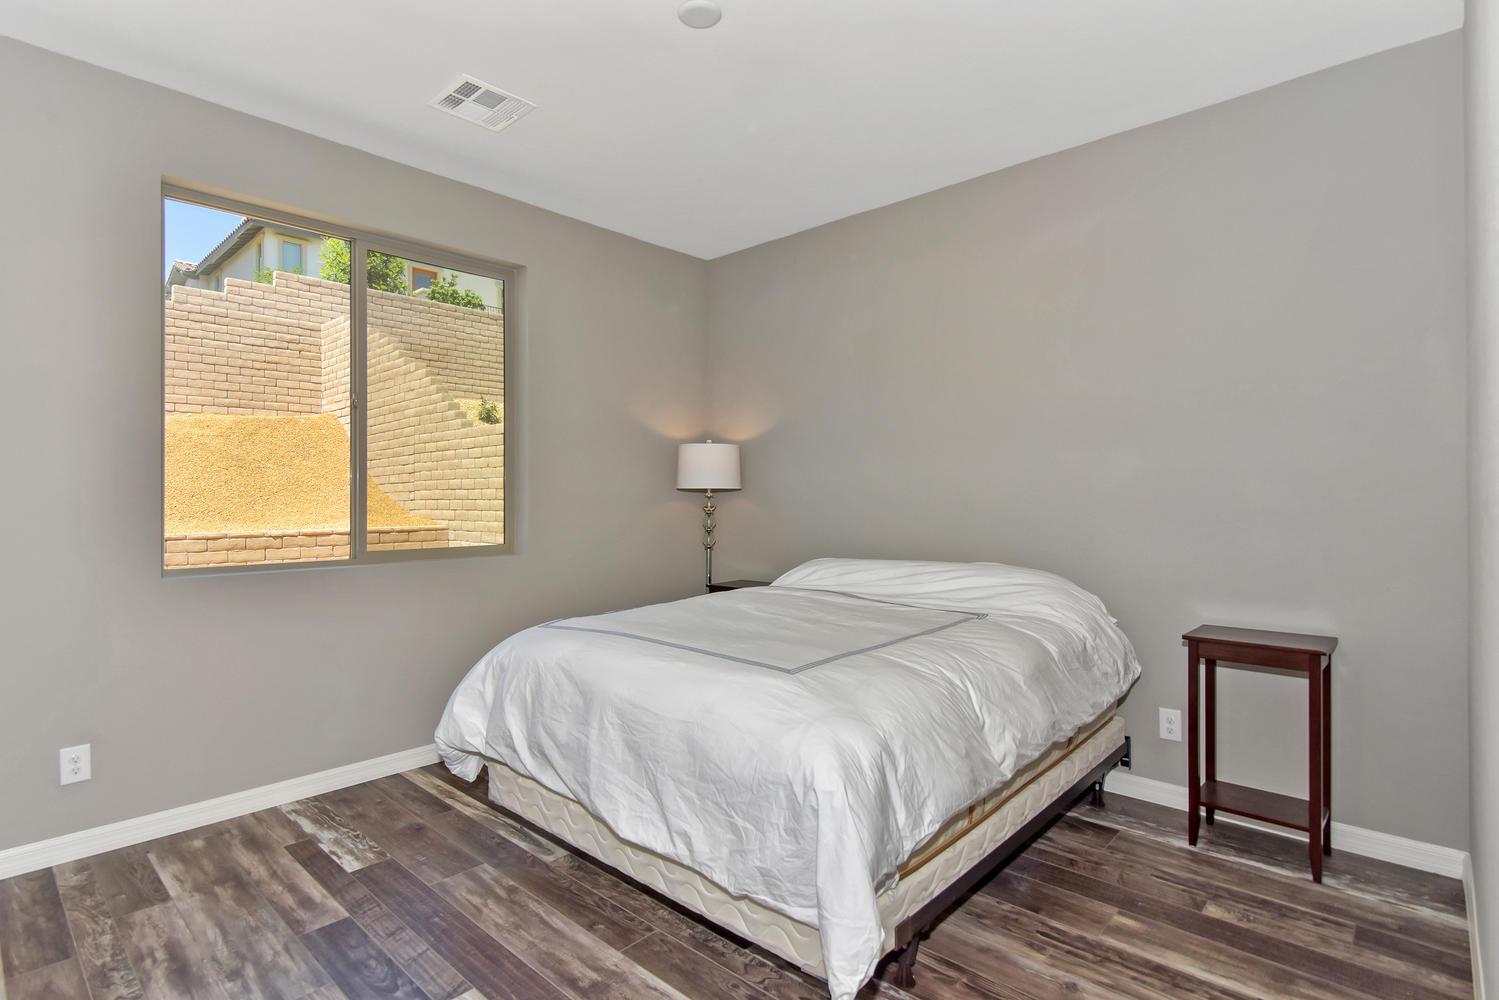 367 Capistrano Vistas Street, Las Vegas, Nevada 89138 - $619,000 home for sale, house images, photos and pics gallery